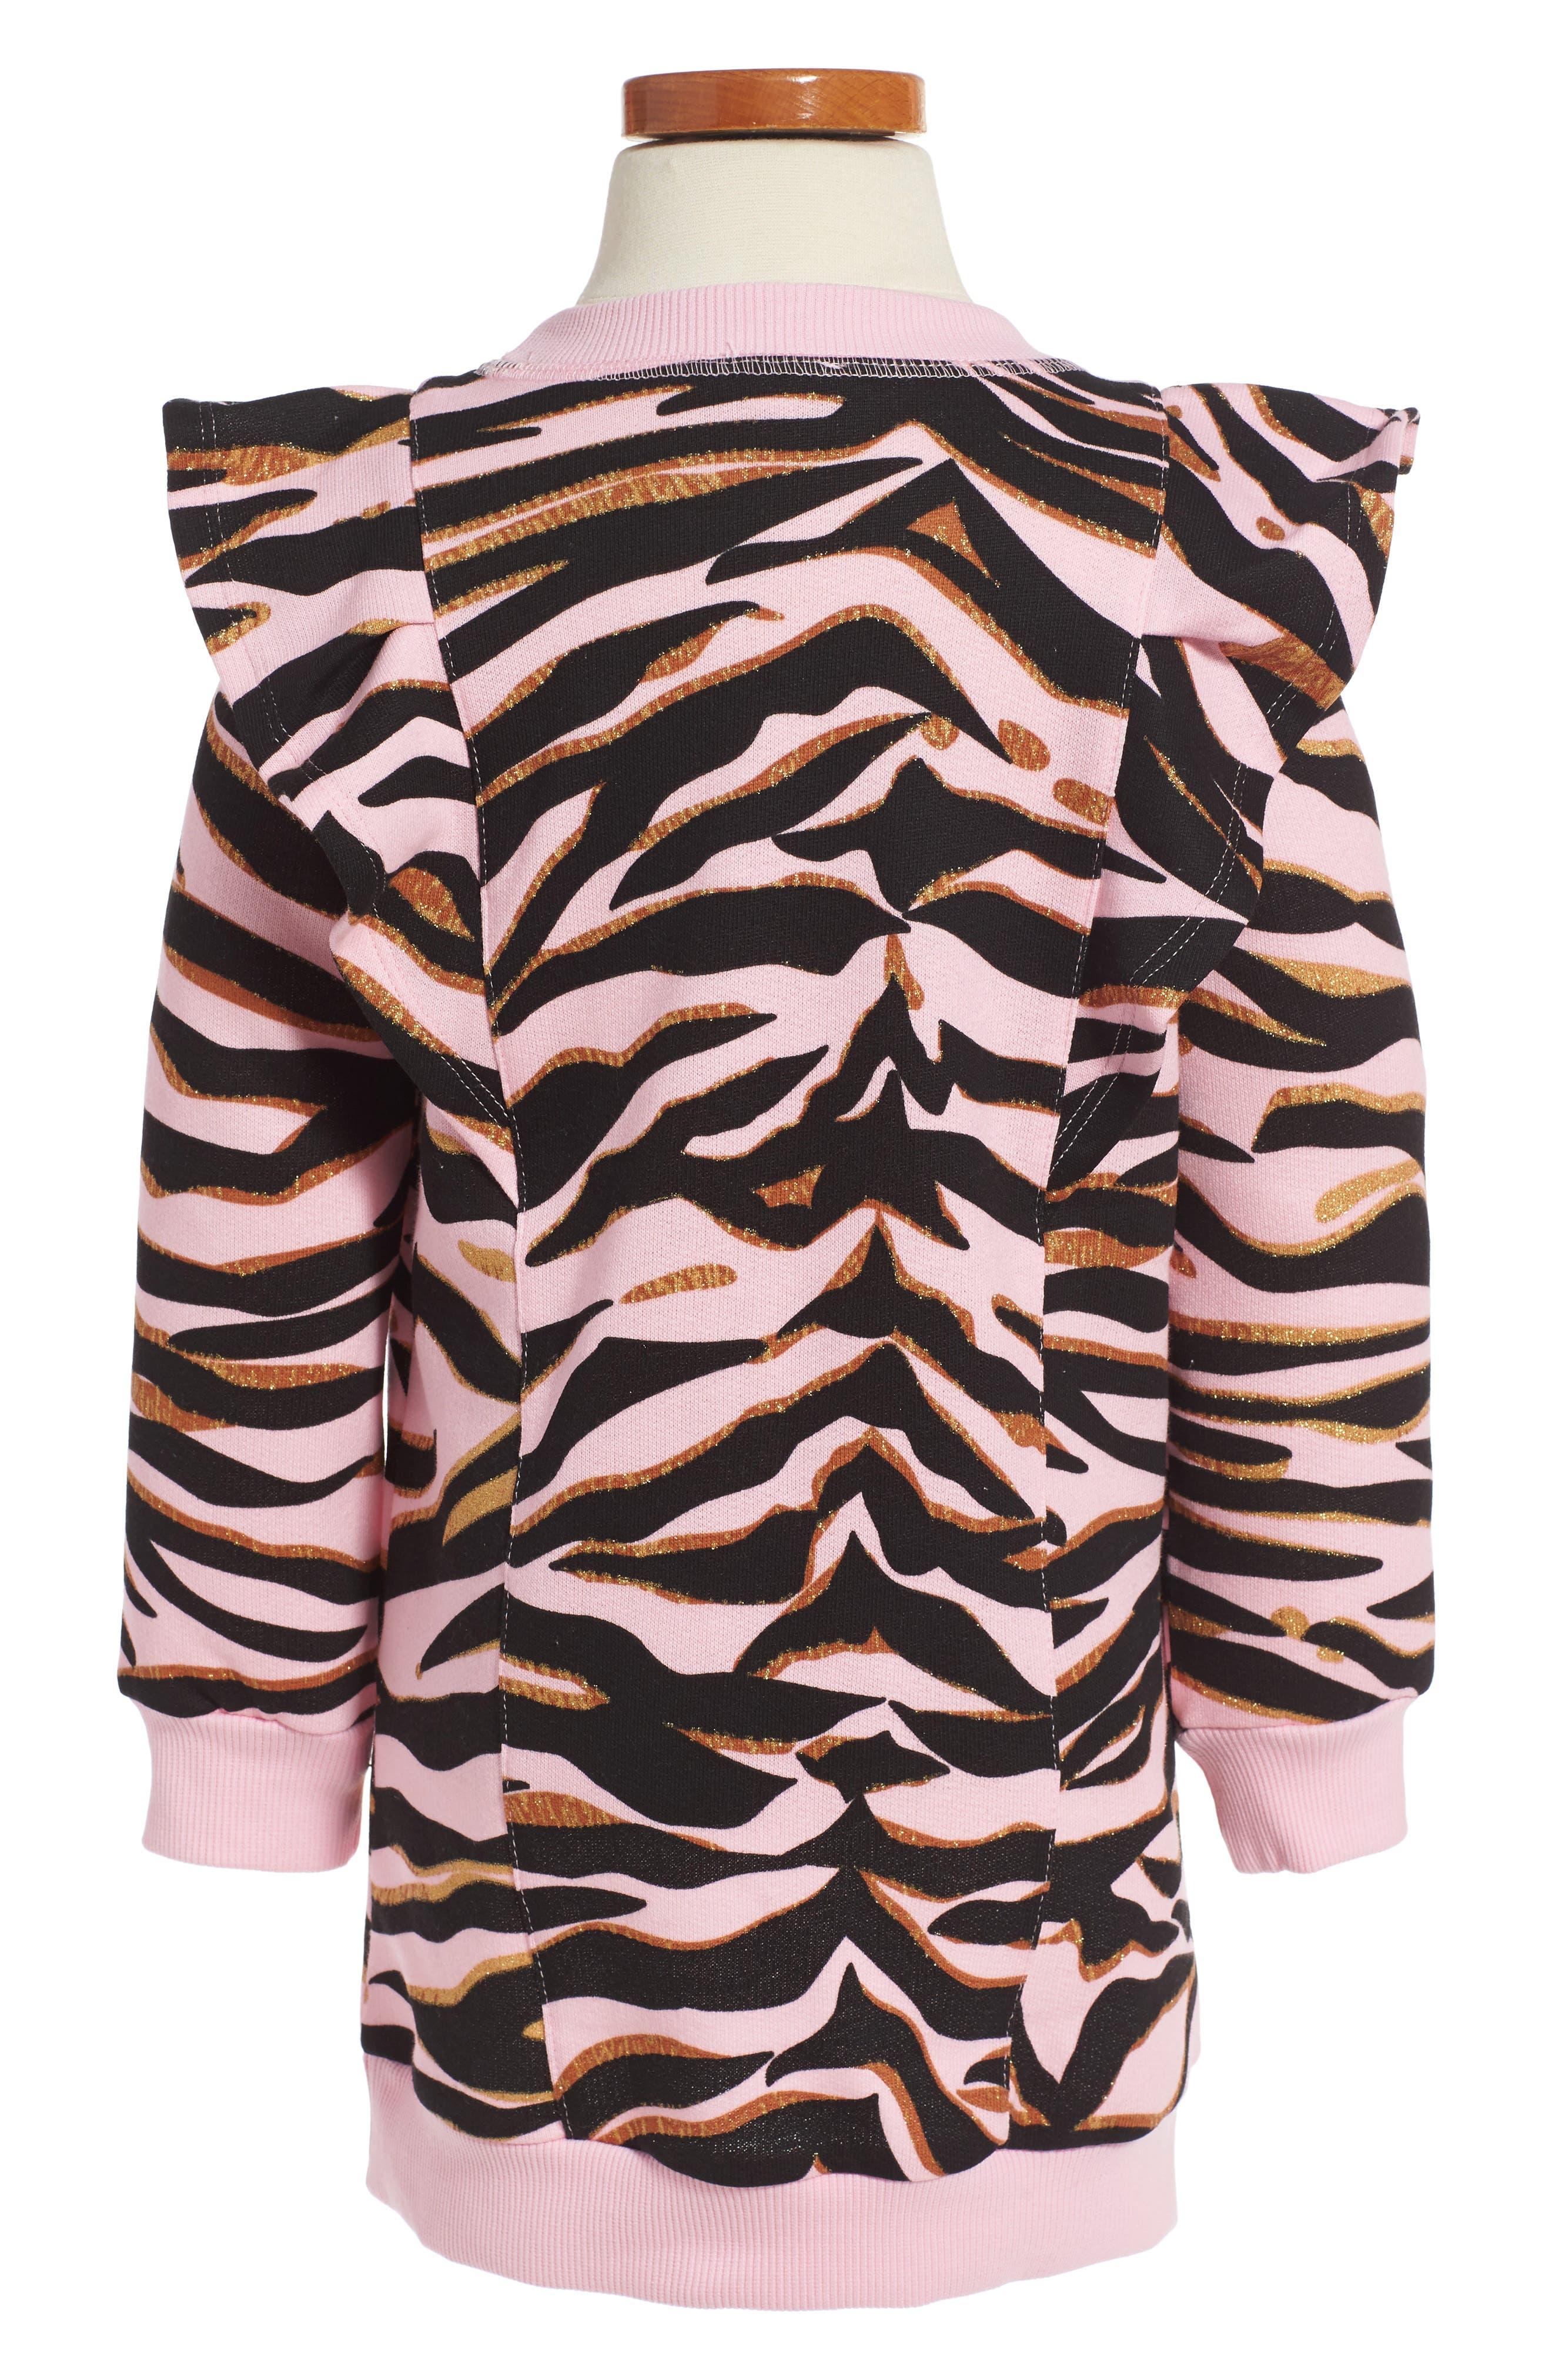 Tiger Sweatshirt Dress,                             Alternate thumbnail 2, color,                             694